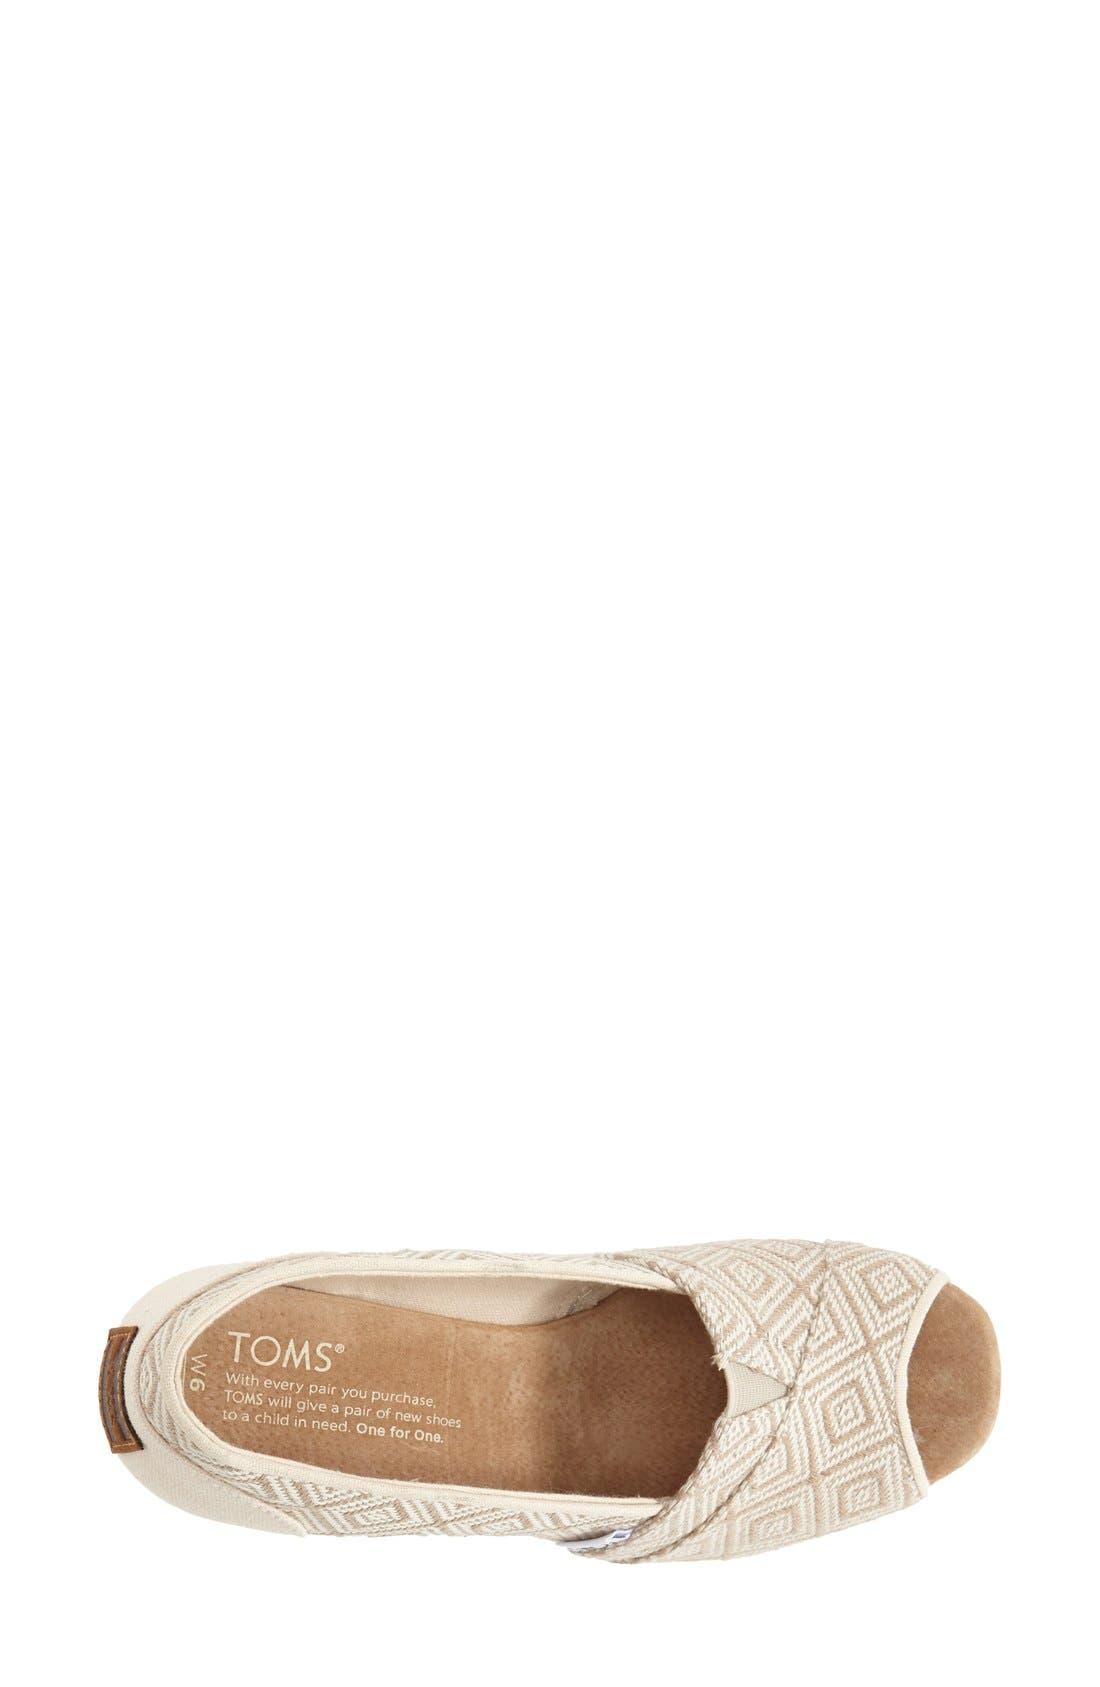 Alternate Image 3  - TOMS 'Classic' Woven Wedge Sandal (Women)